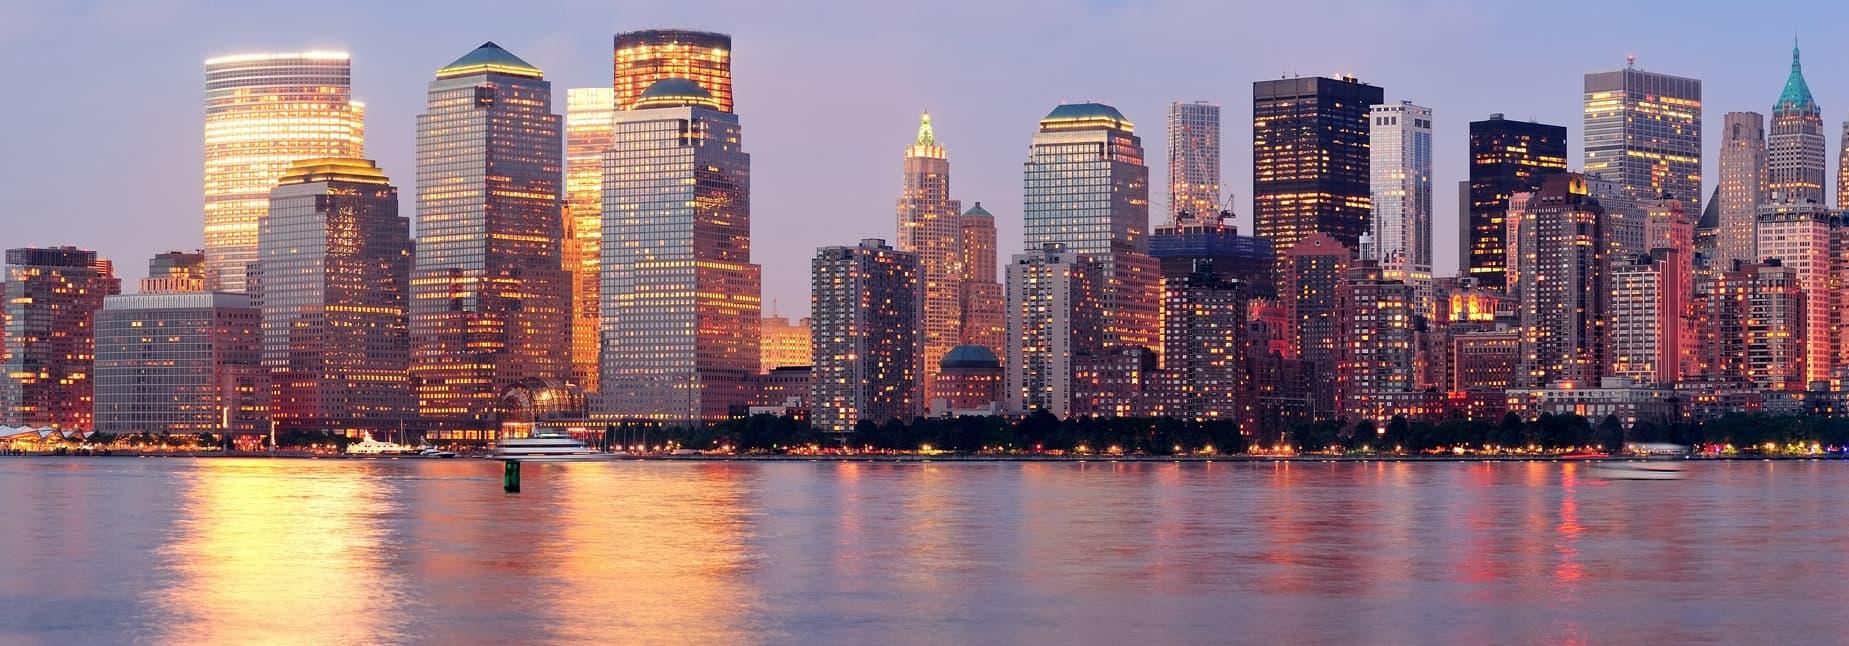 Nova Iorque:  4 noites + voos, desde 813€